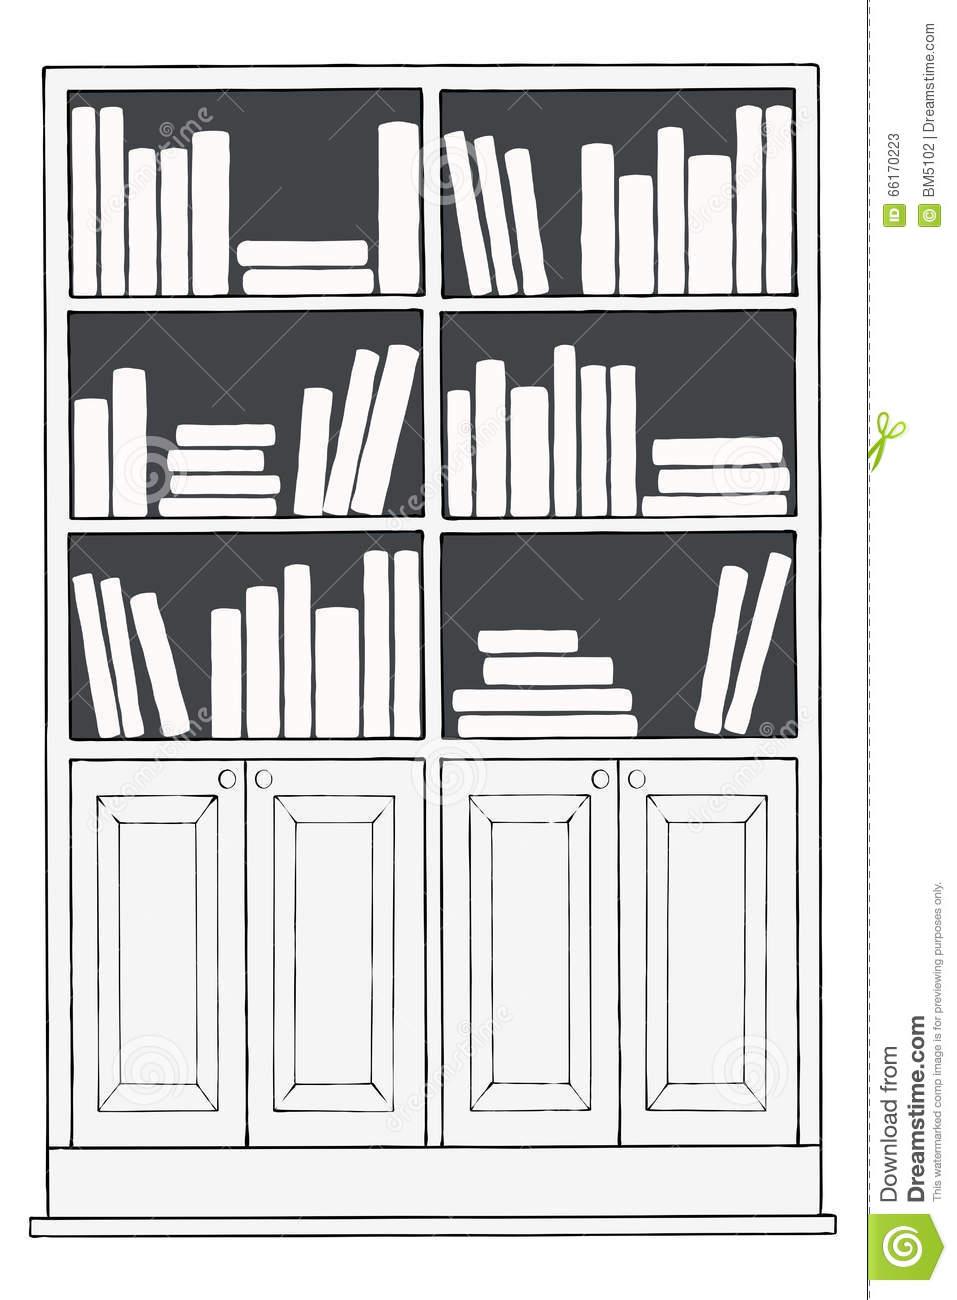 Bookshelf Png Black And White & Free Bookshelf Black And White.png.